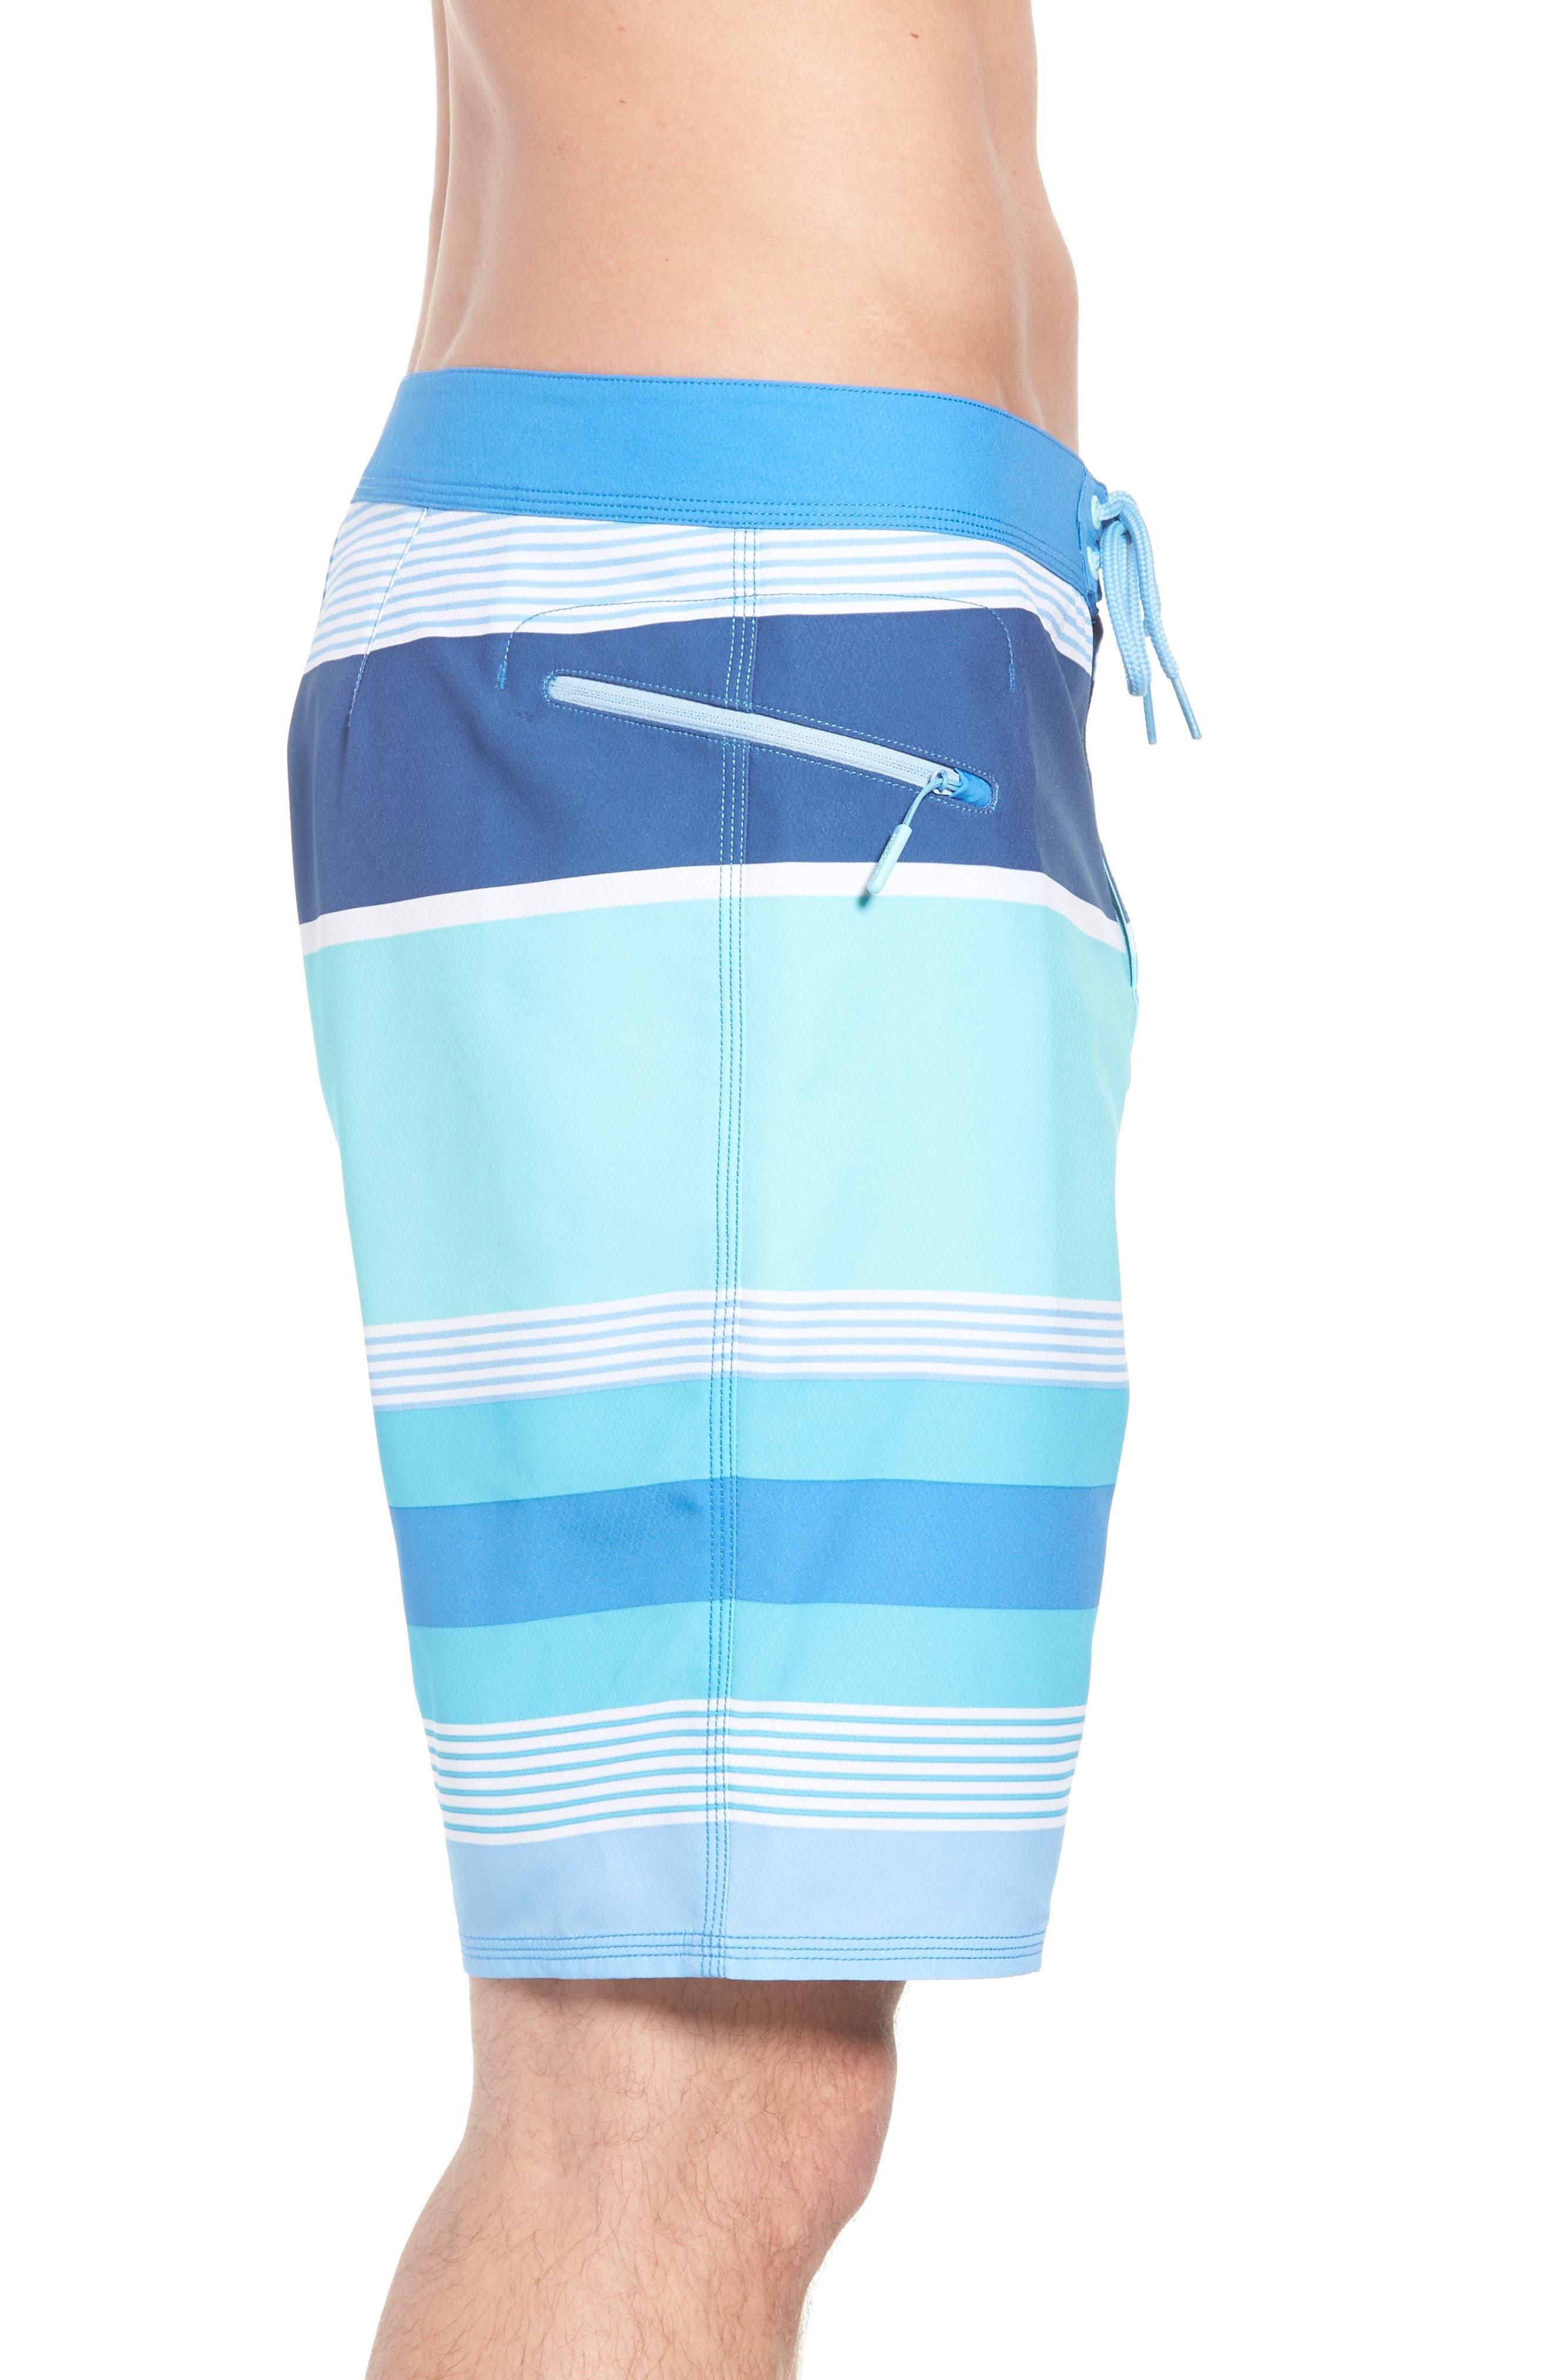 Peaks Island Board Shorts,                             Alternate thumbnail 3, color,                             Poolside